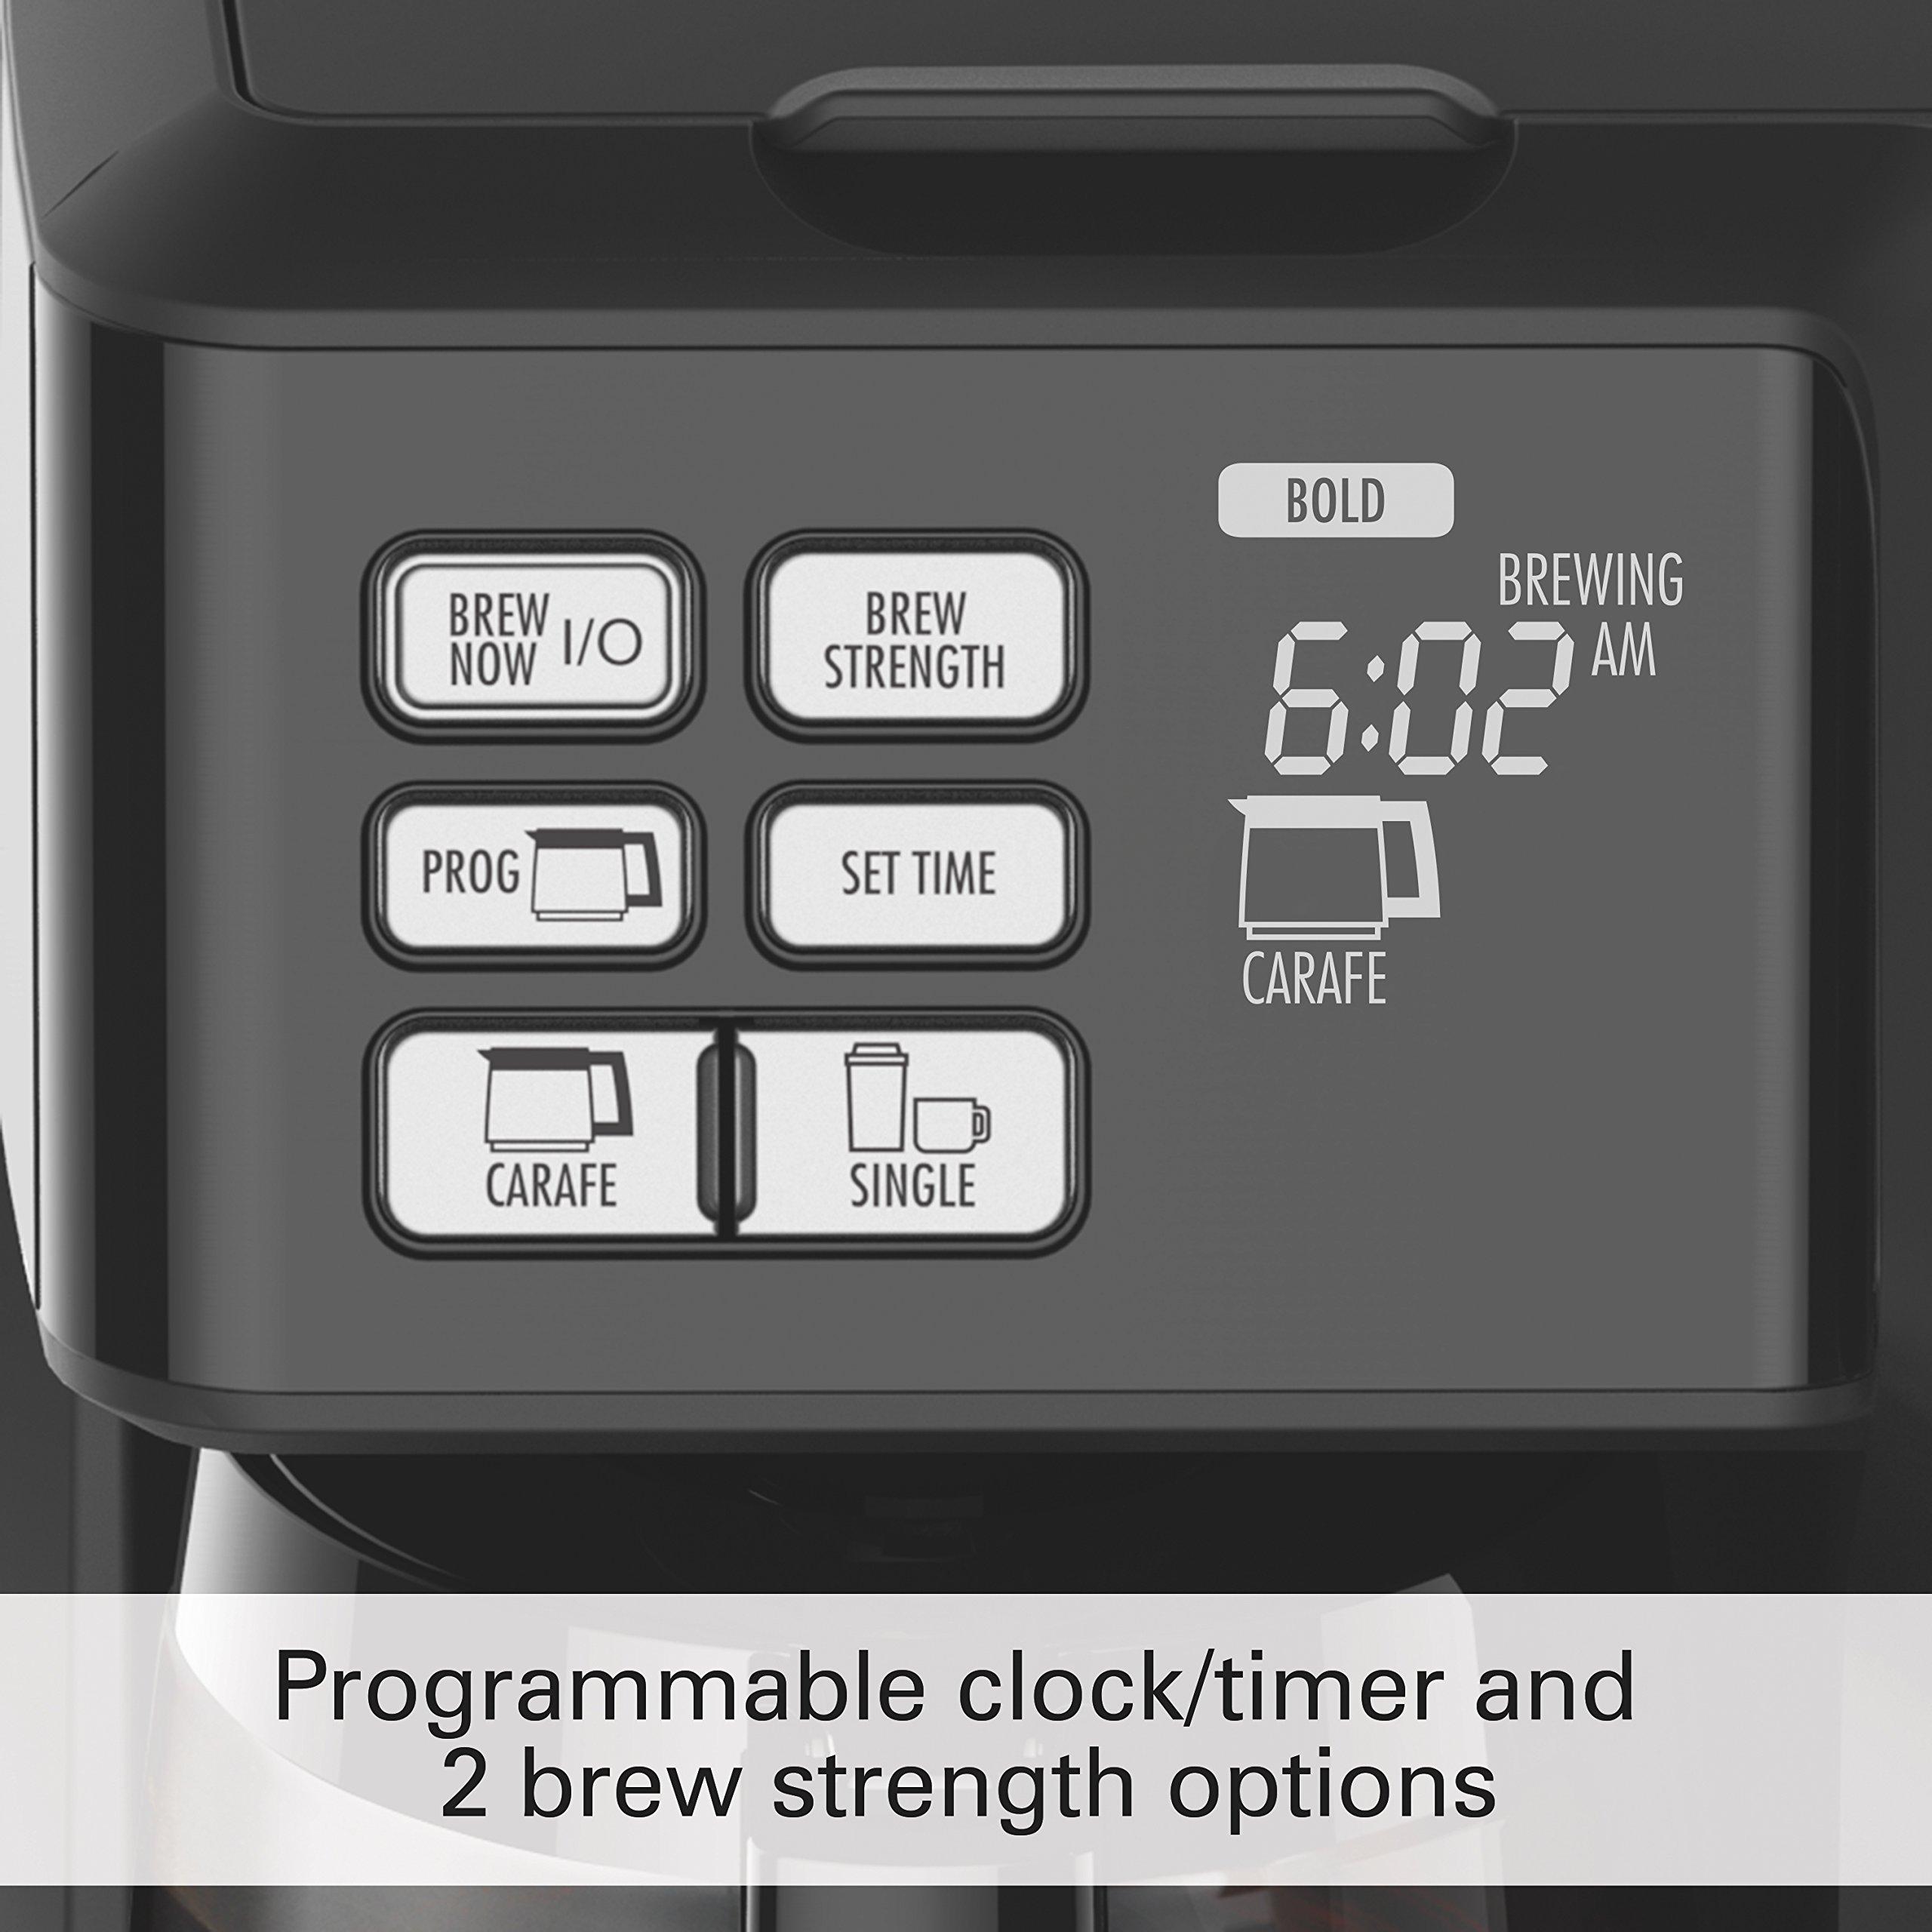 Hamilton Beach 49950C Flexbrew 2-Way Brewer Programmable Coffee Maker, Black by Hamilton Beach (Image #4)